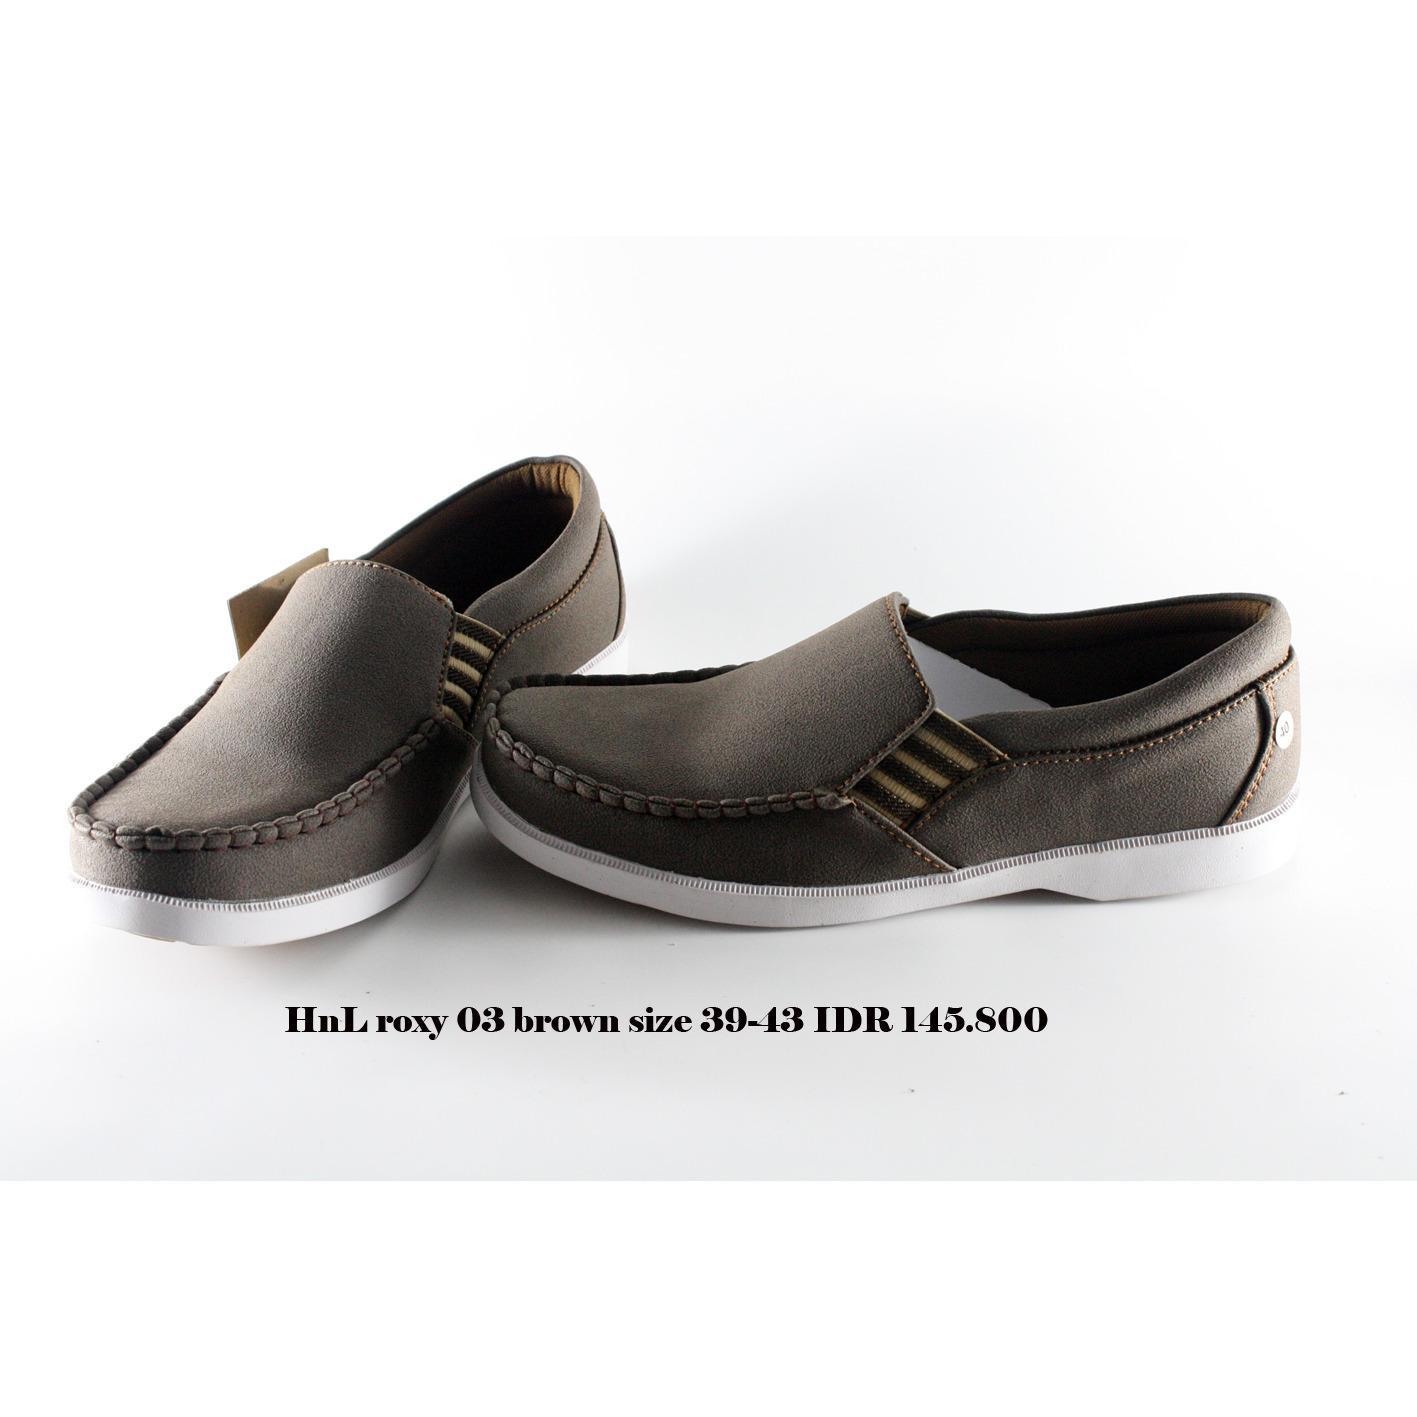 hnl roxy 03 sepatu kets pria coklat